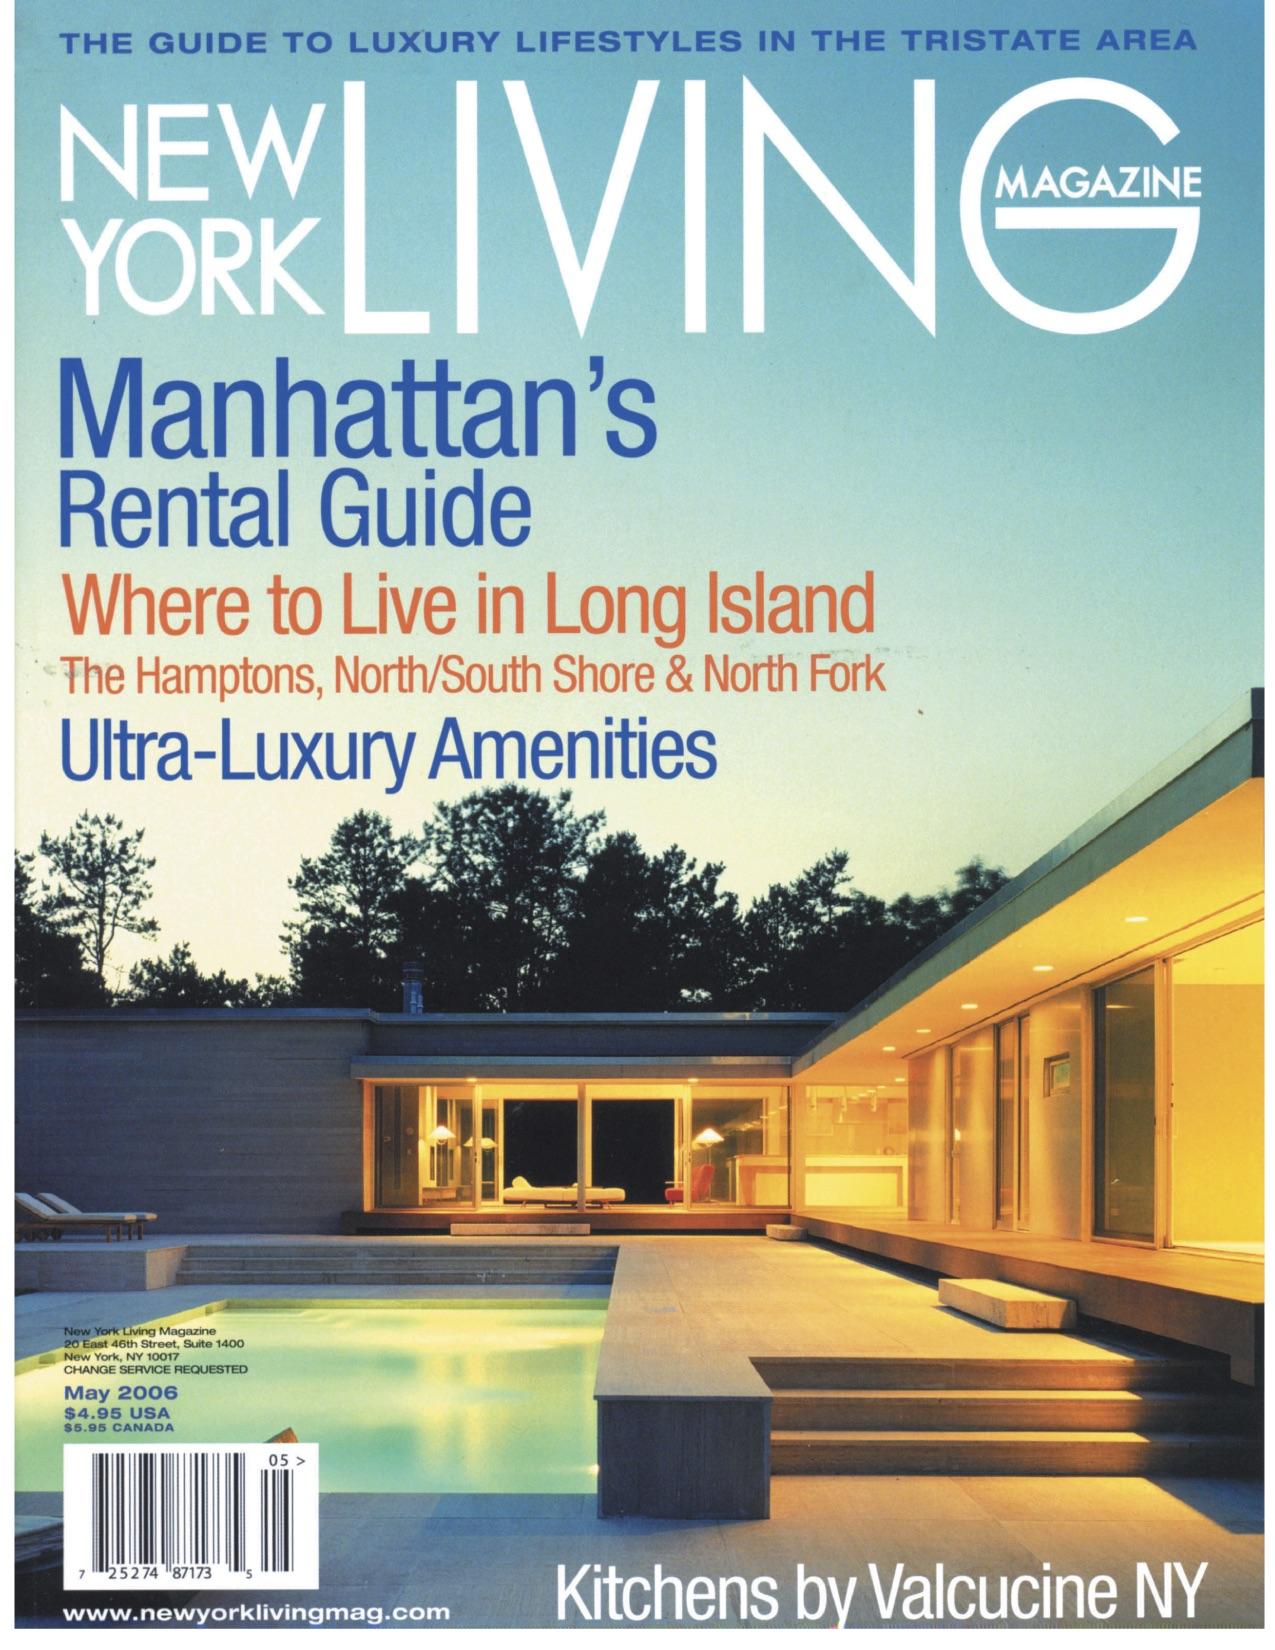 05.06 NY LIVING MAGAZINE (SAGAPONAC HOUSE)